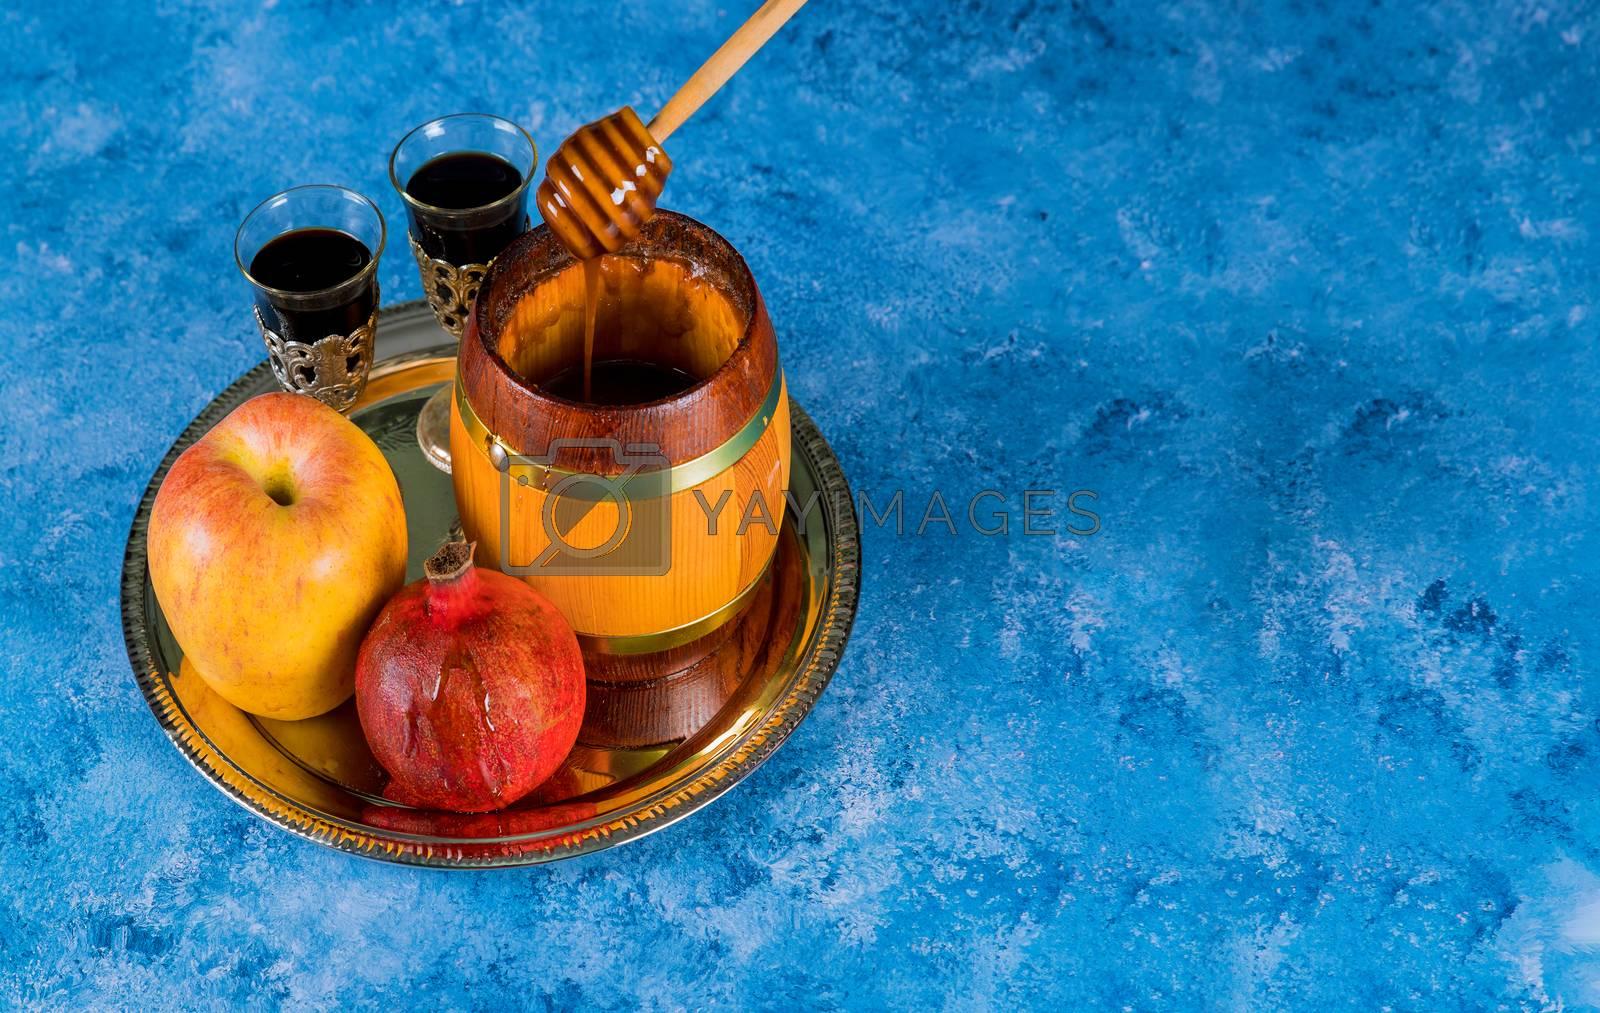 Rosh hashanah with glass honey jar and fresh ripe apples. Jewesh new year symbols